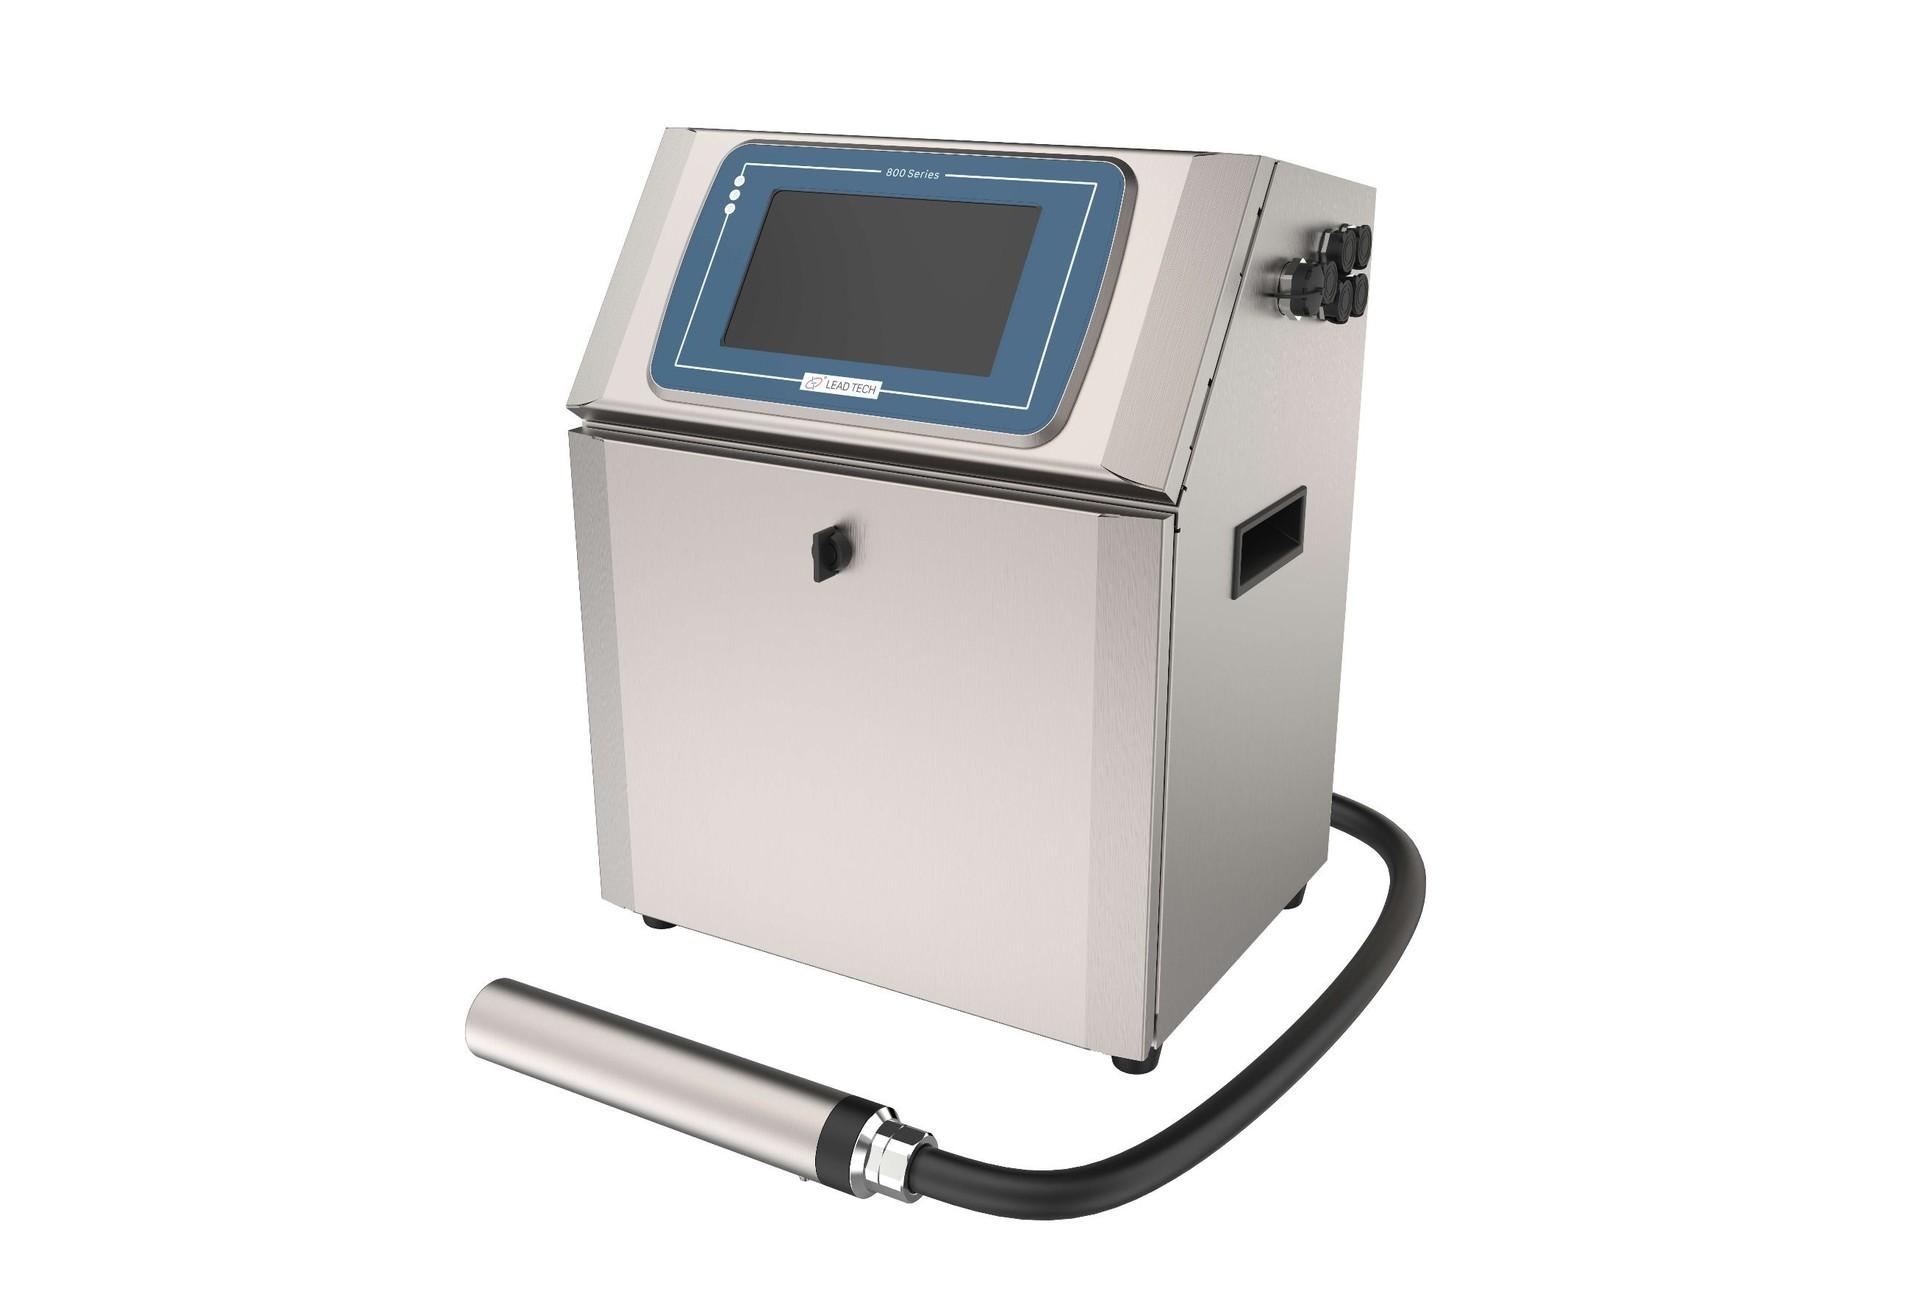 Lead Tech Lt800 Plastic film Cij Inkjet Printer